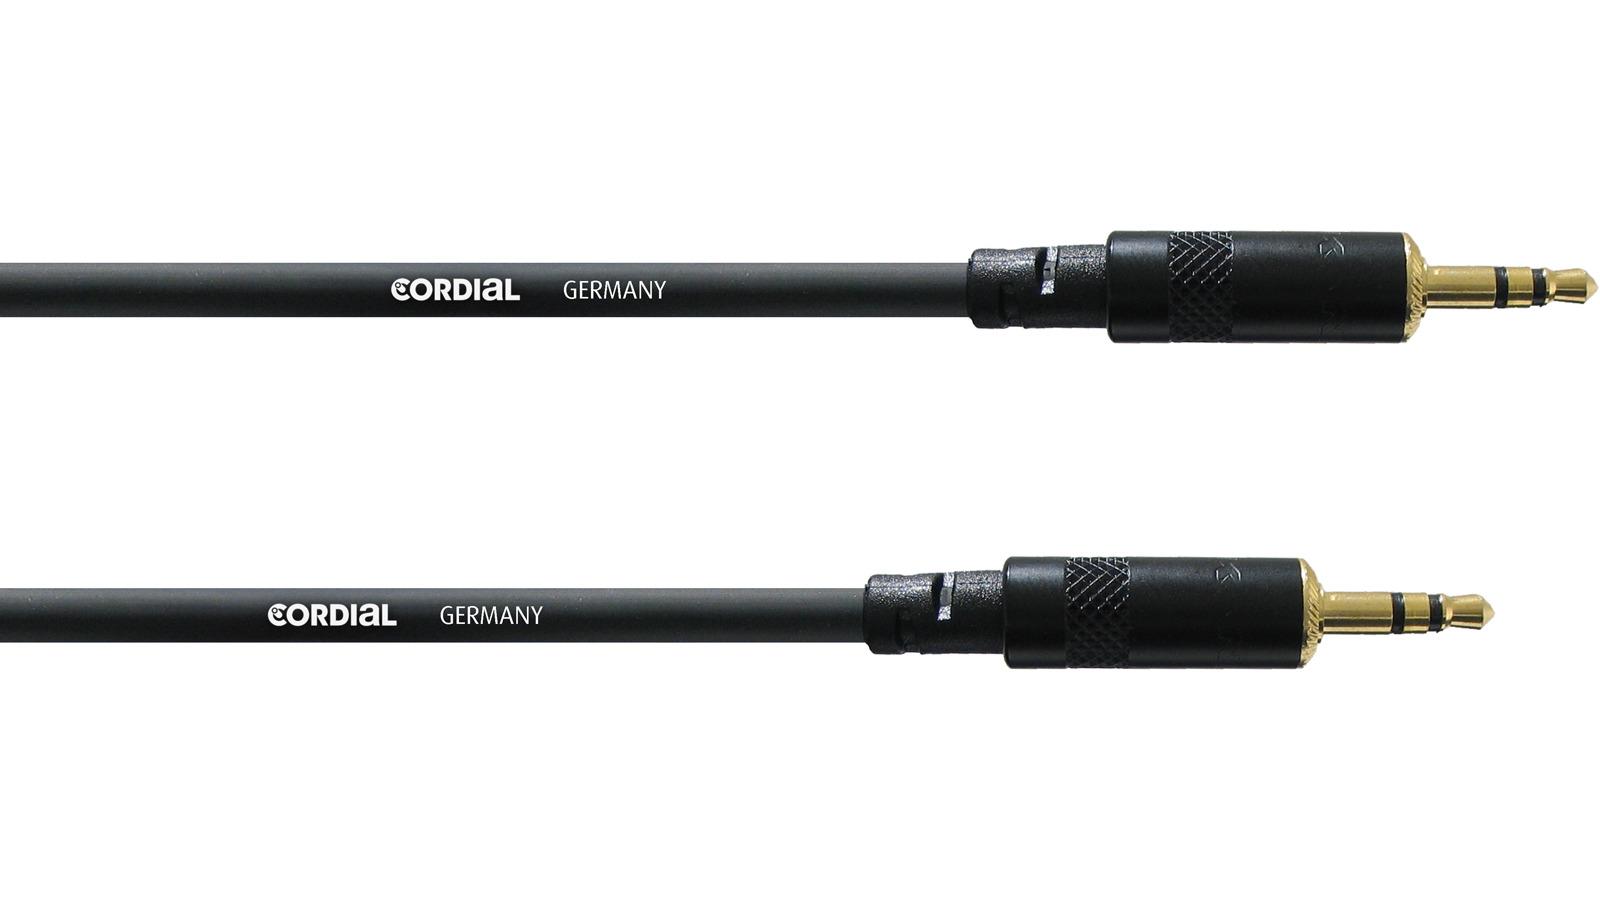 Cordial CFS 3 WW symmetrisches Mini Klinke Kabel 3 m